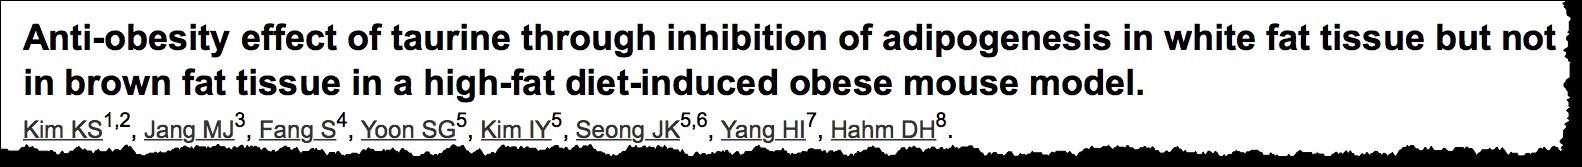 Anti-obesity effect of taurine